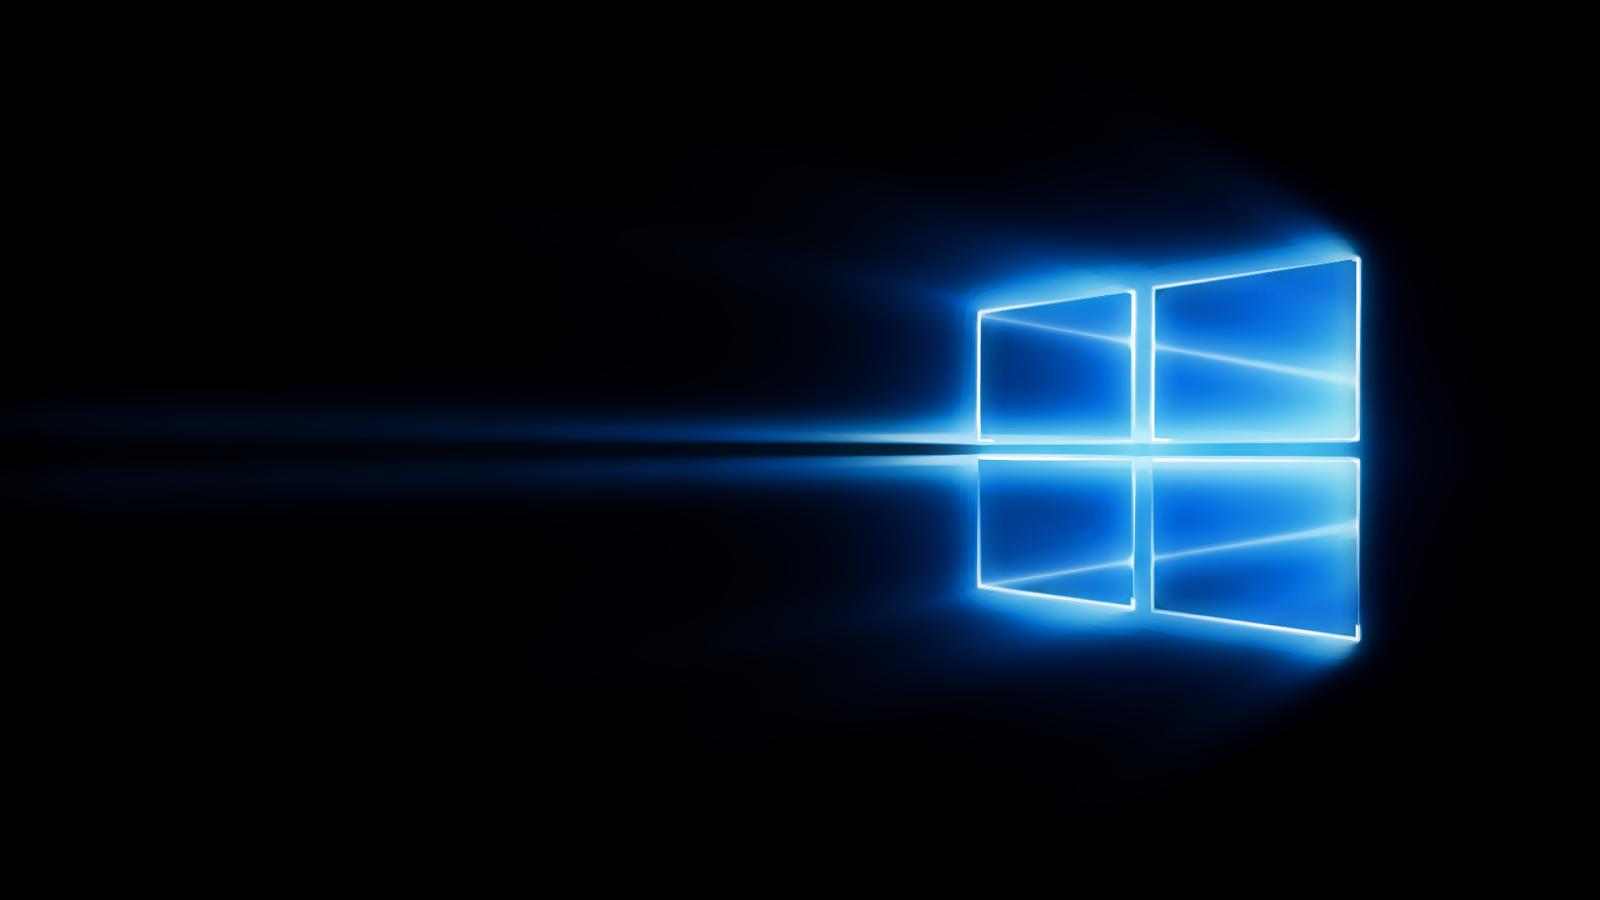 Windows 10 HD Wallpapers Free: Windows 10 Dark Free Download